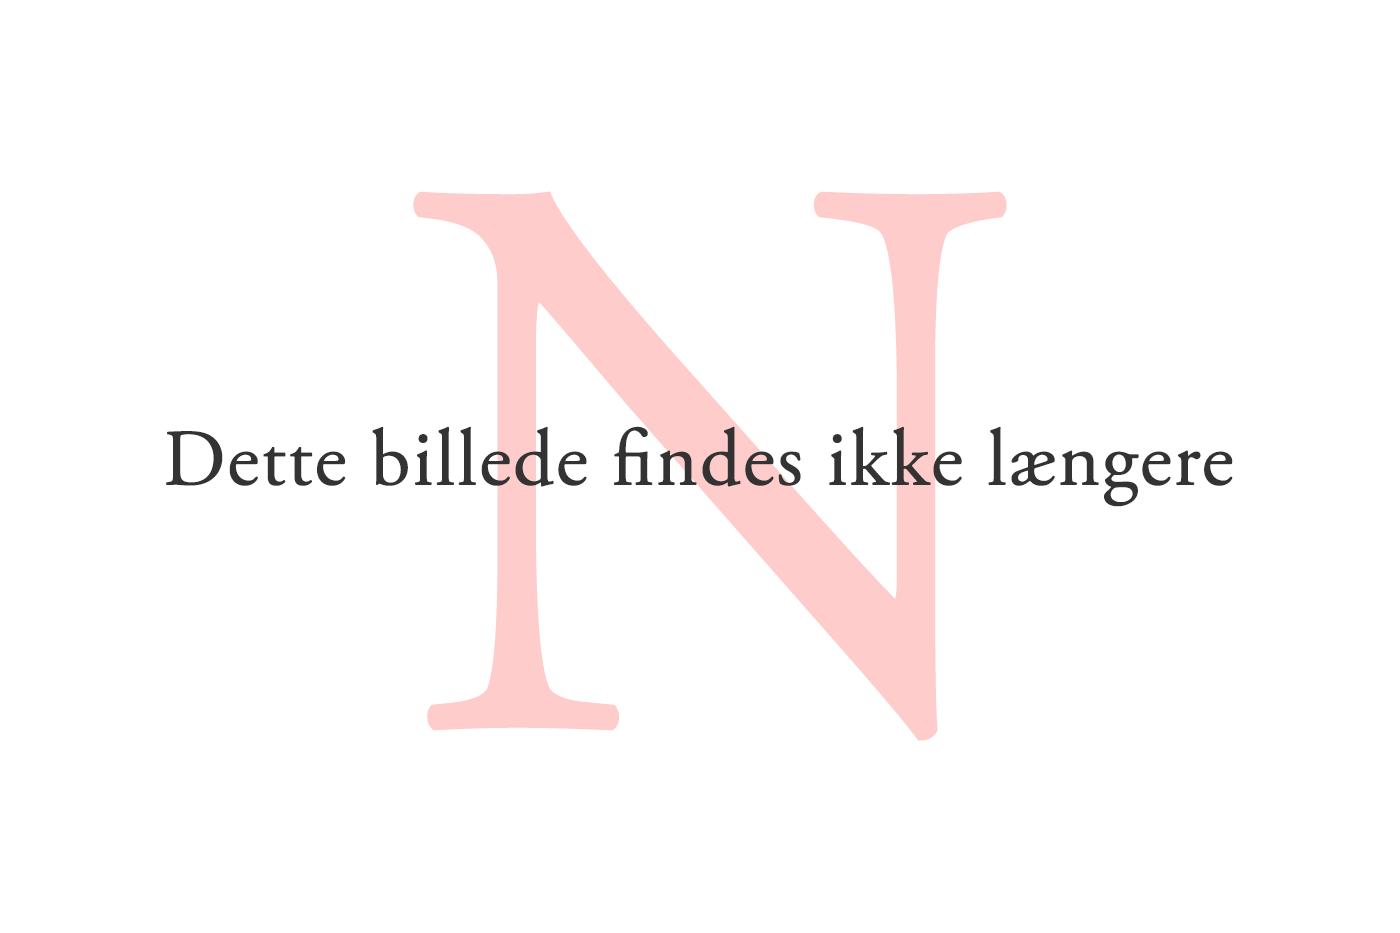 Kilde: Scanrobot.dk